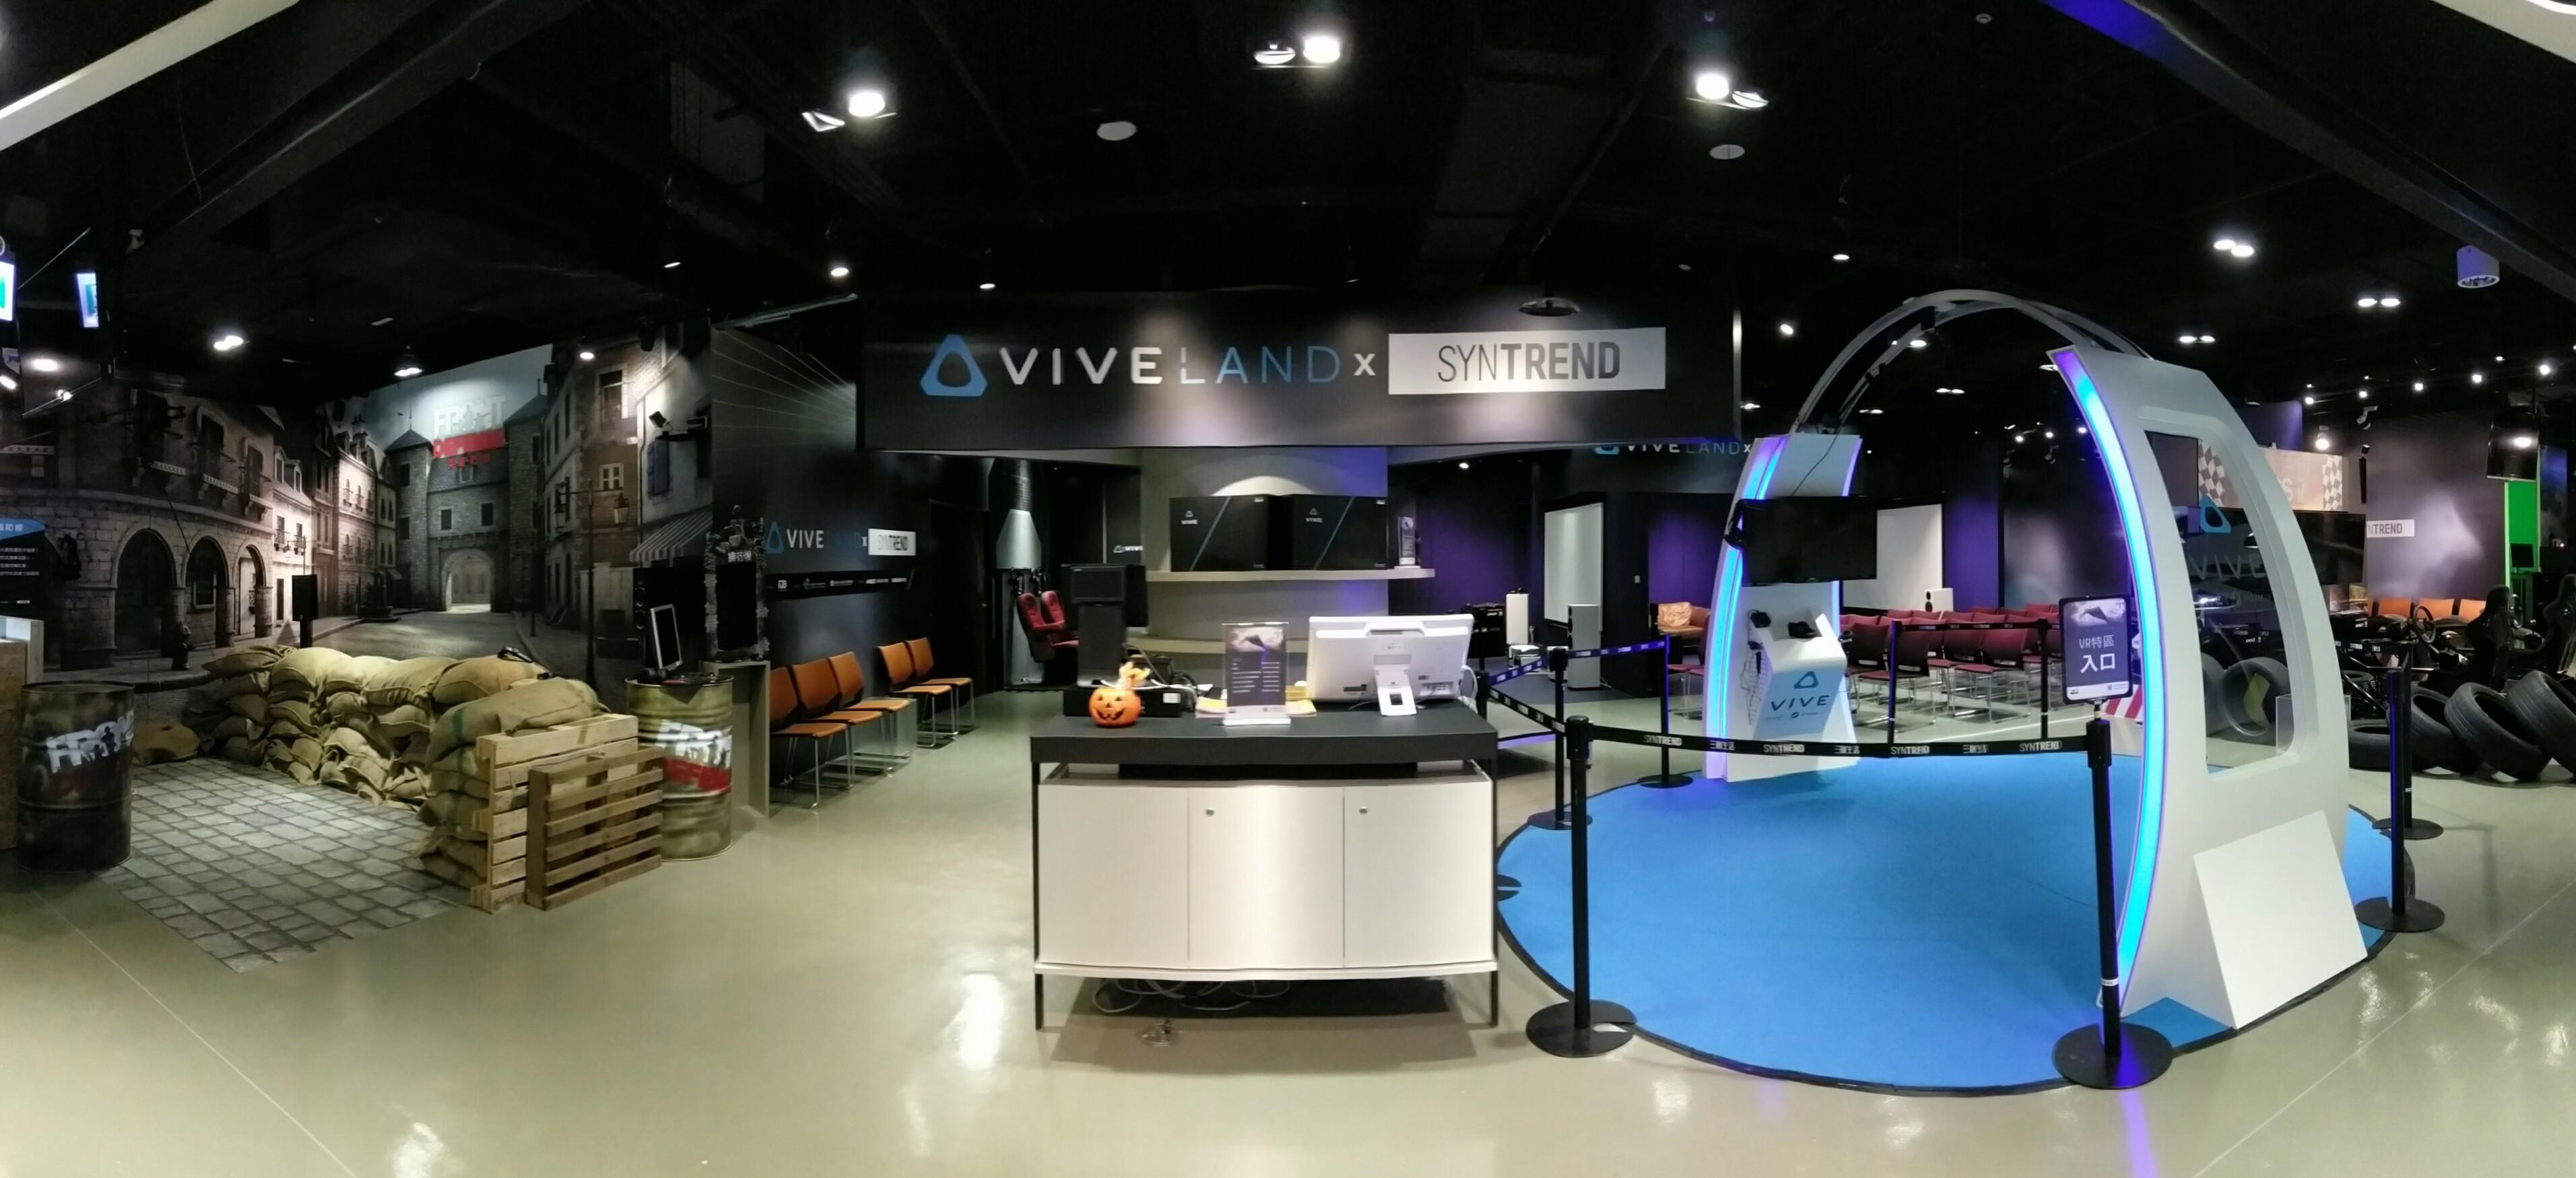 htc-vive-vr-arcade-viveland-syntrend-taipei